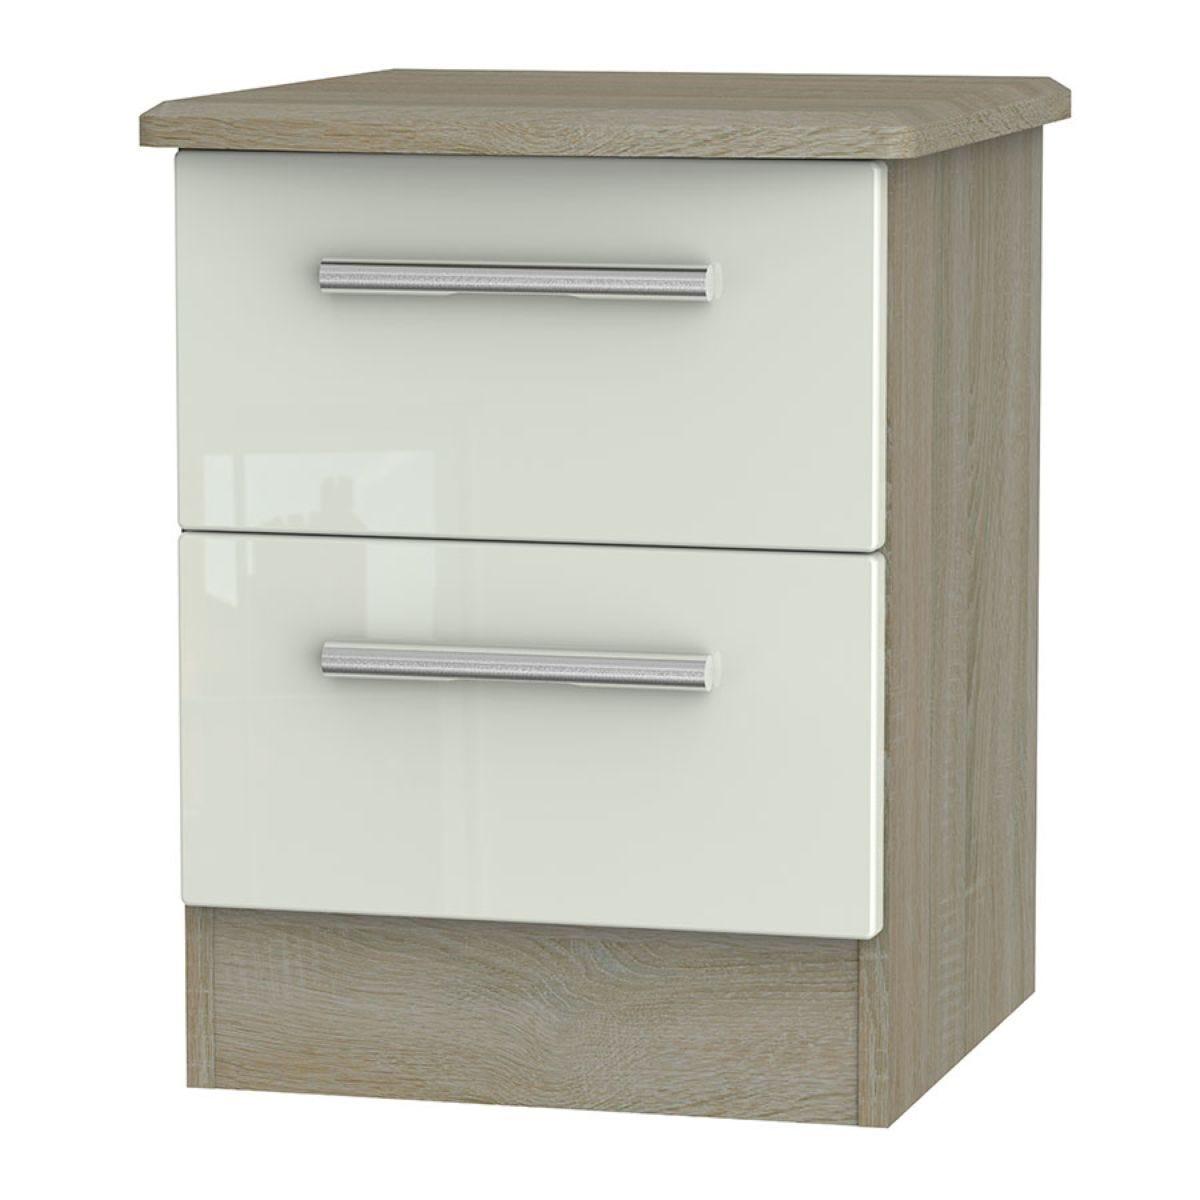 Kirkhill 2-Drawer Bedside Table - Taupe Cedar